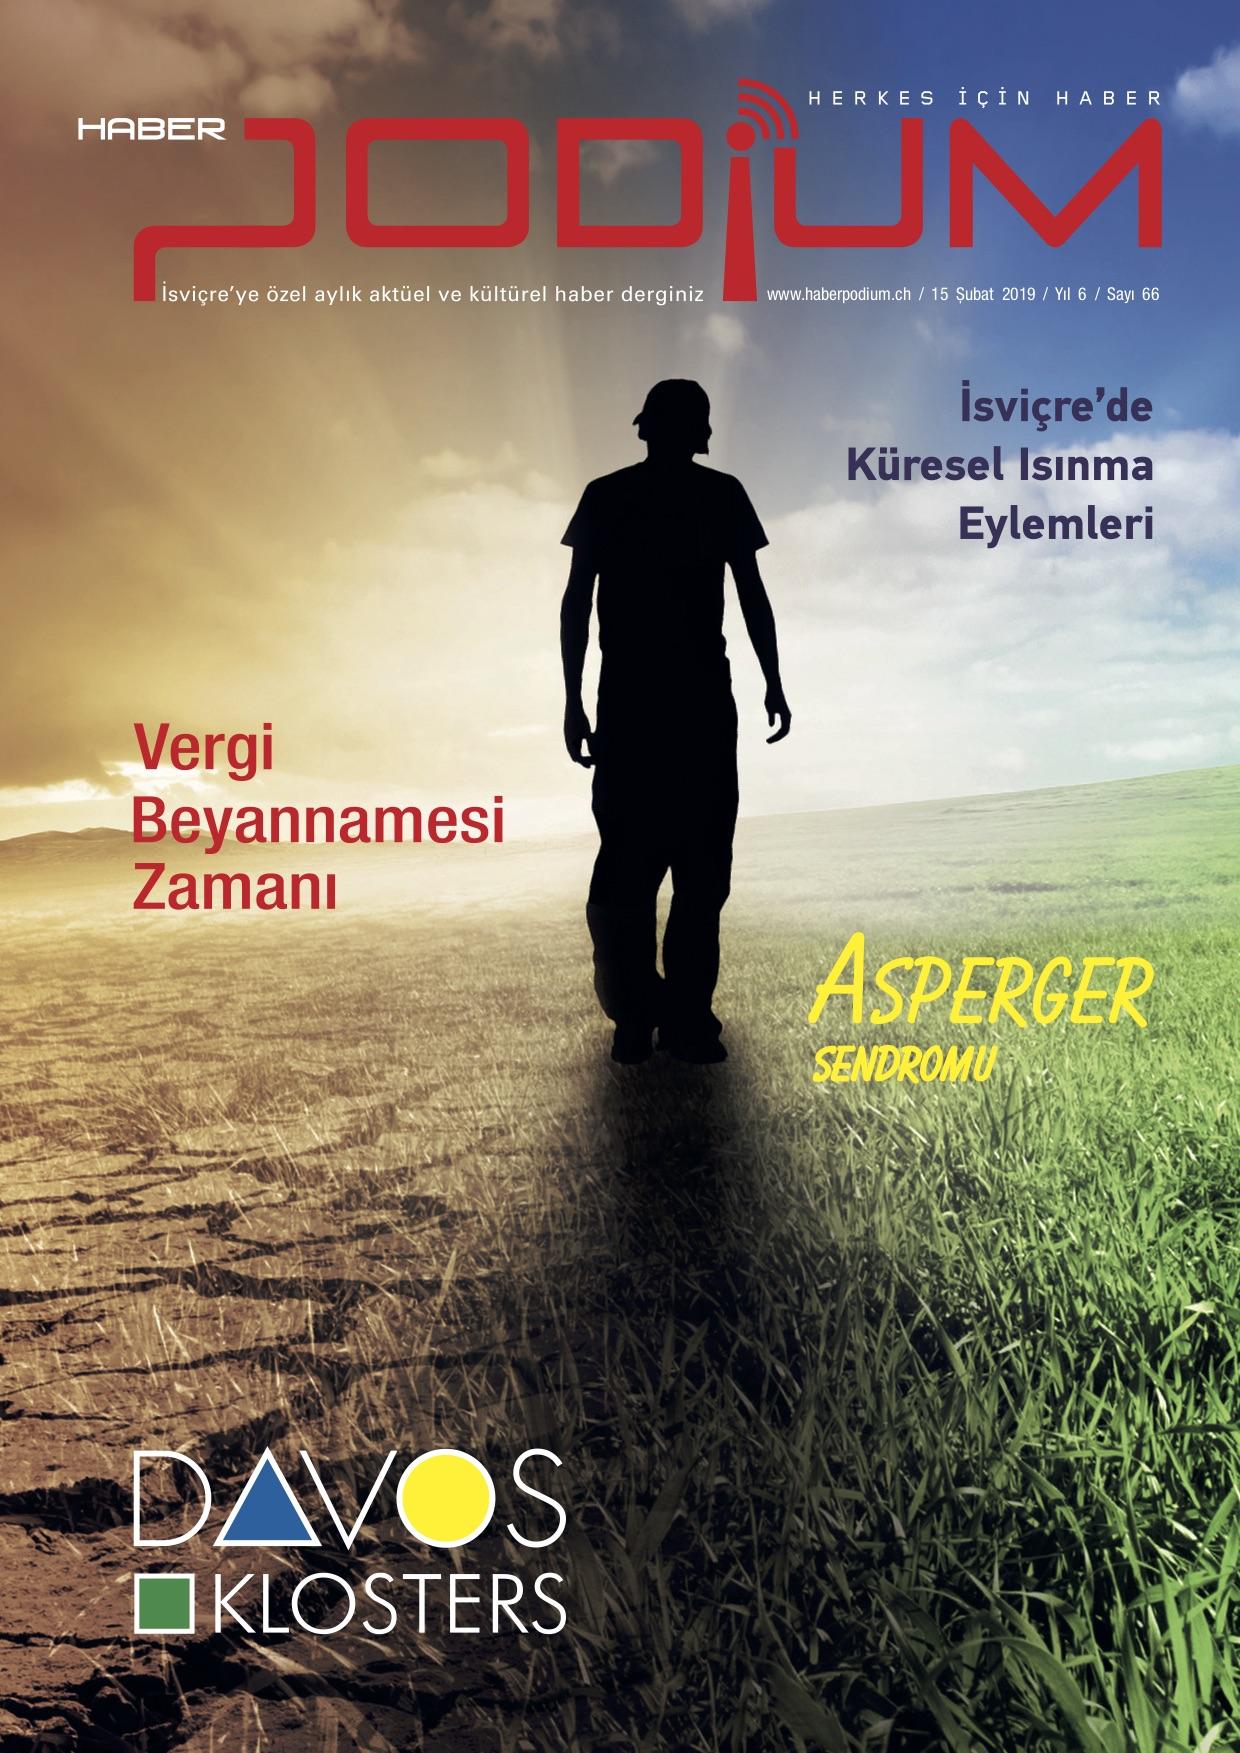 Isvicre haberleri,isvicre gündemi, www.haberpodium.ch